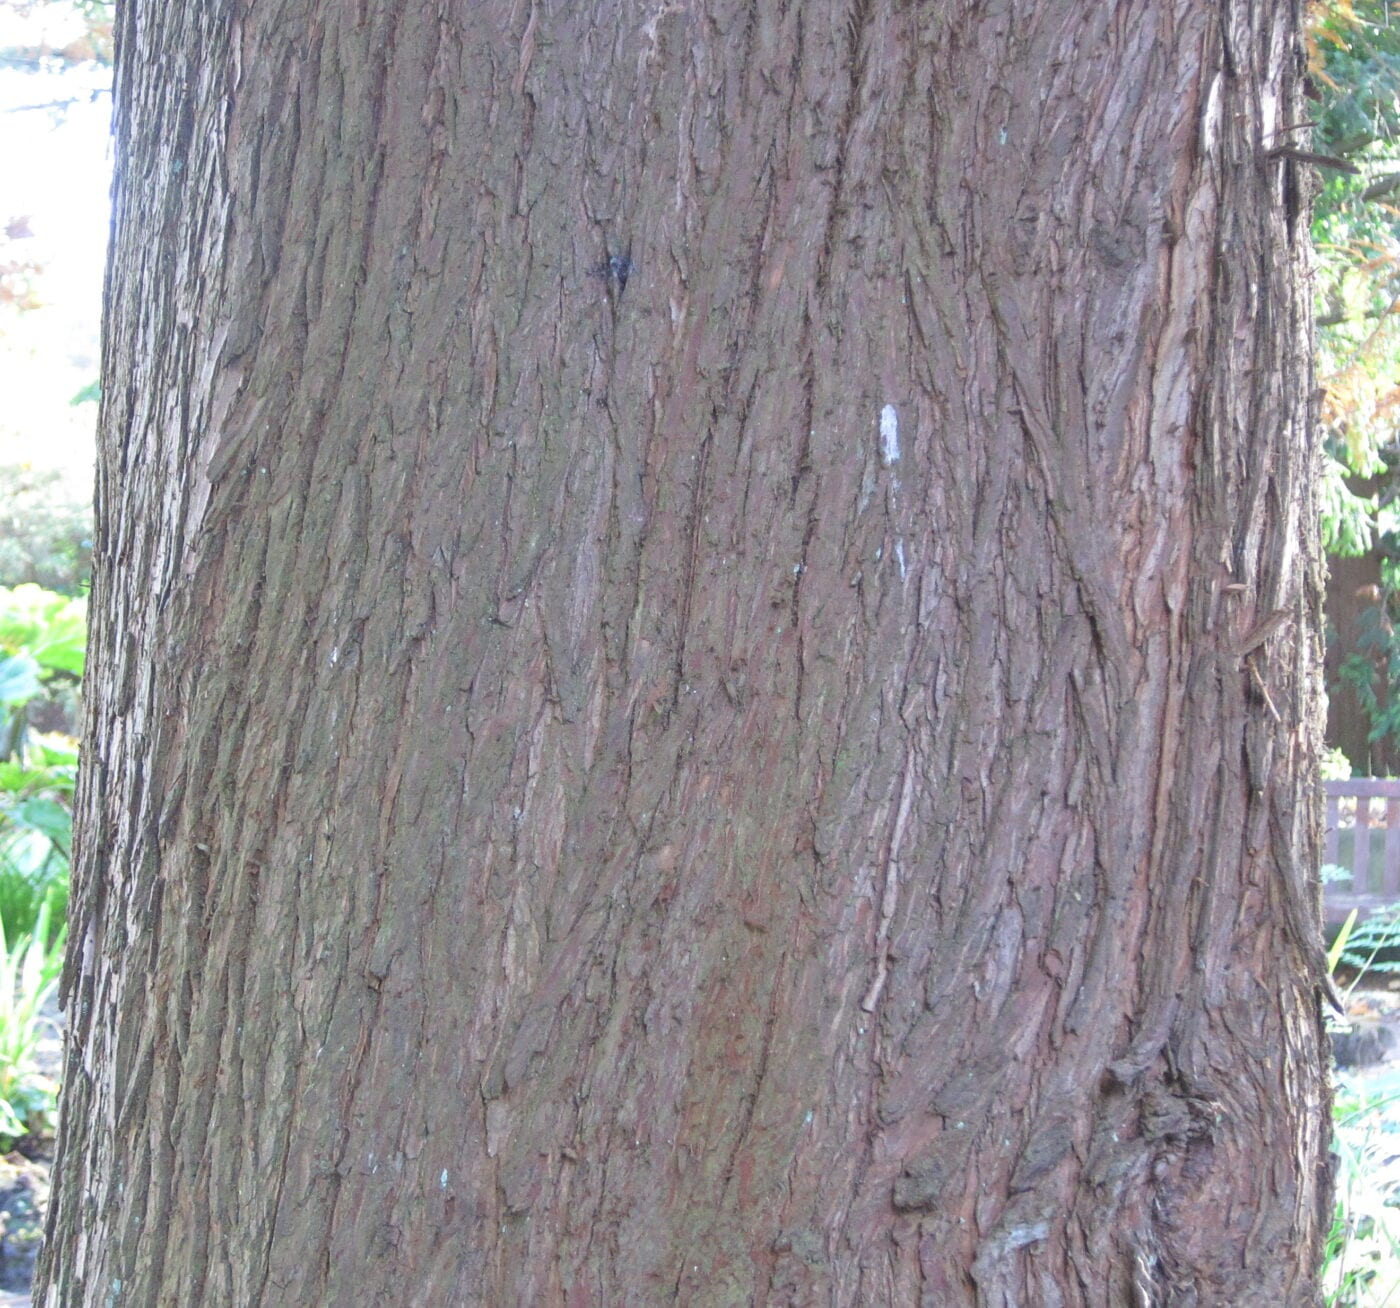 Swamp Cypress bark